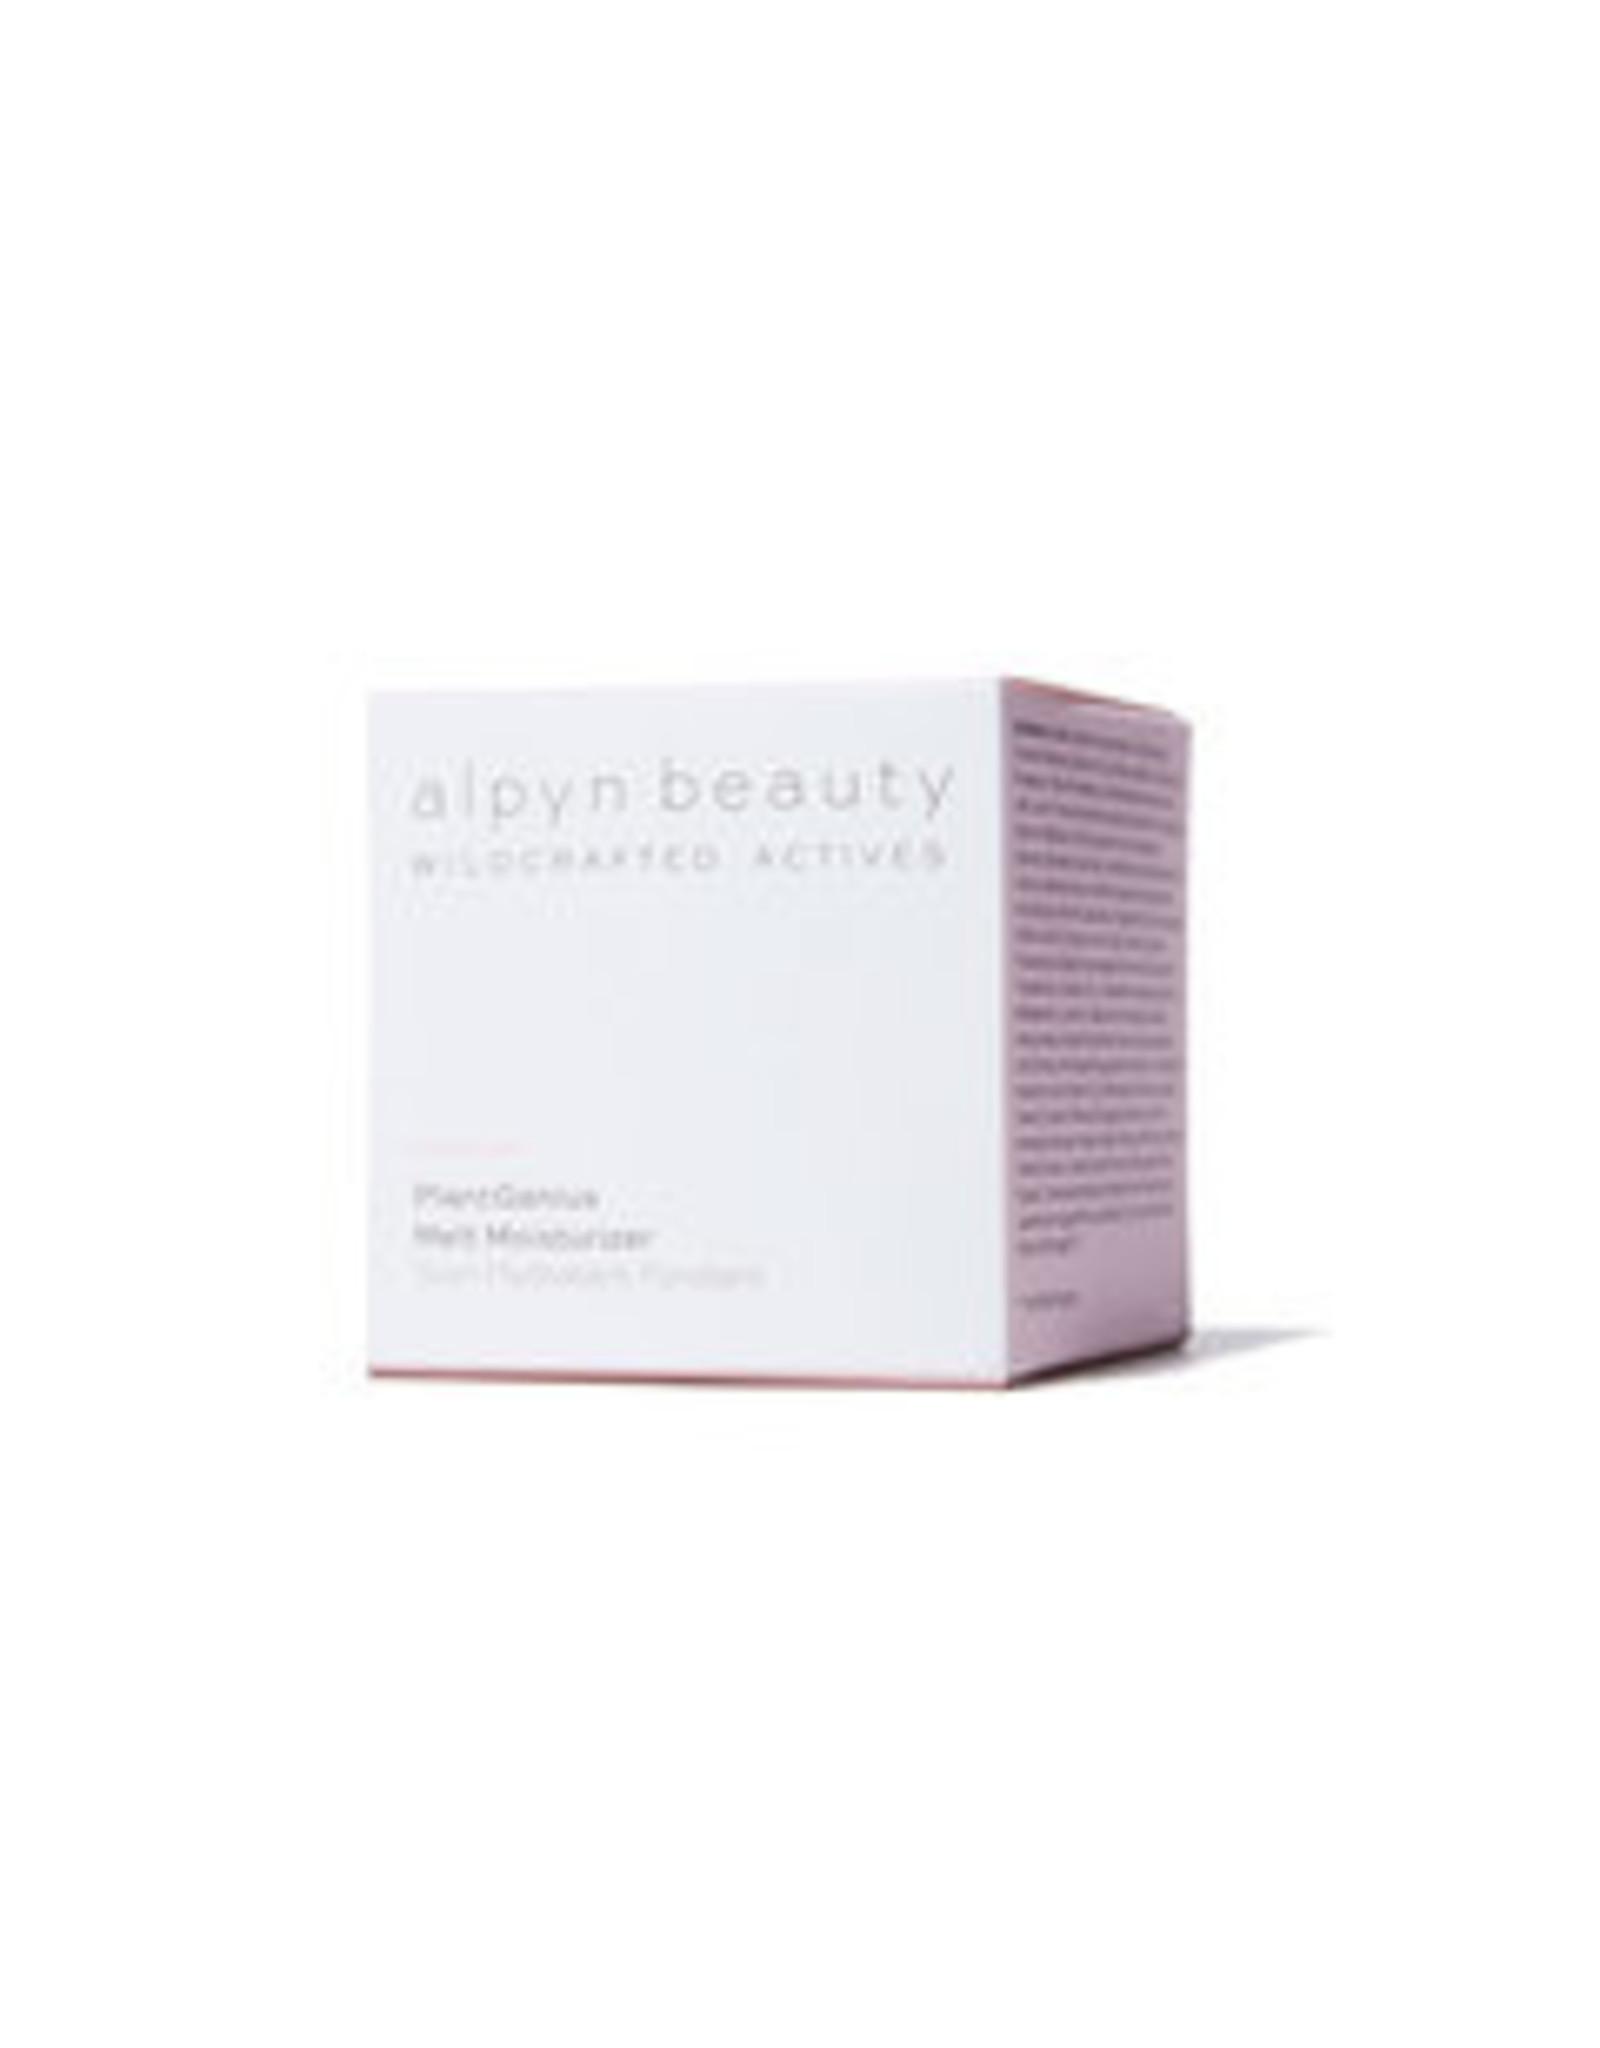 Alpyn Beauty Alpyn Beauty PlantGenius Melt Moisturizer